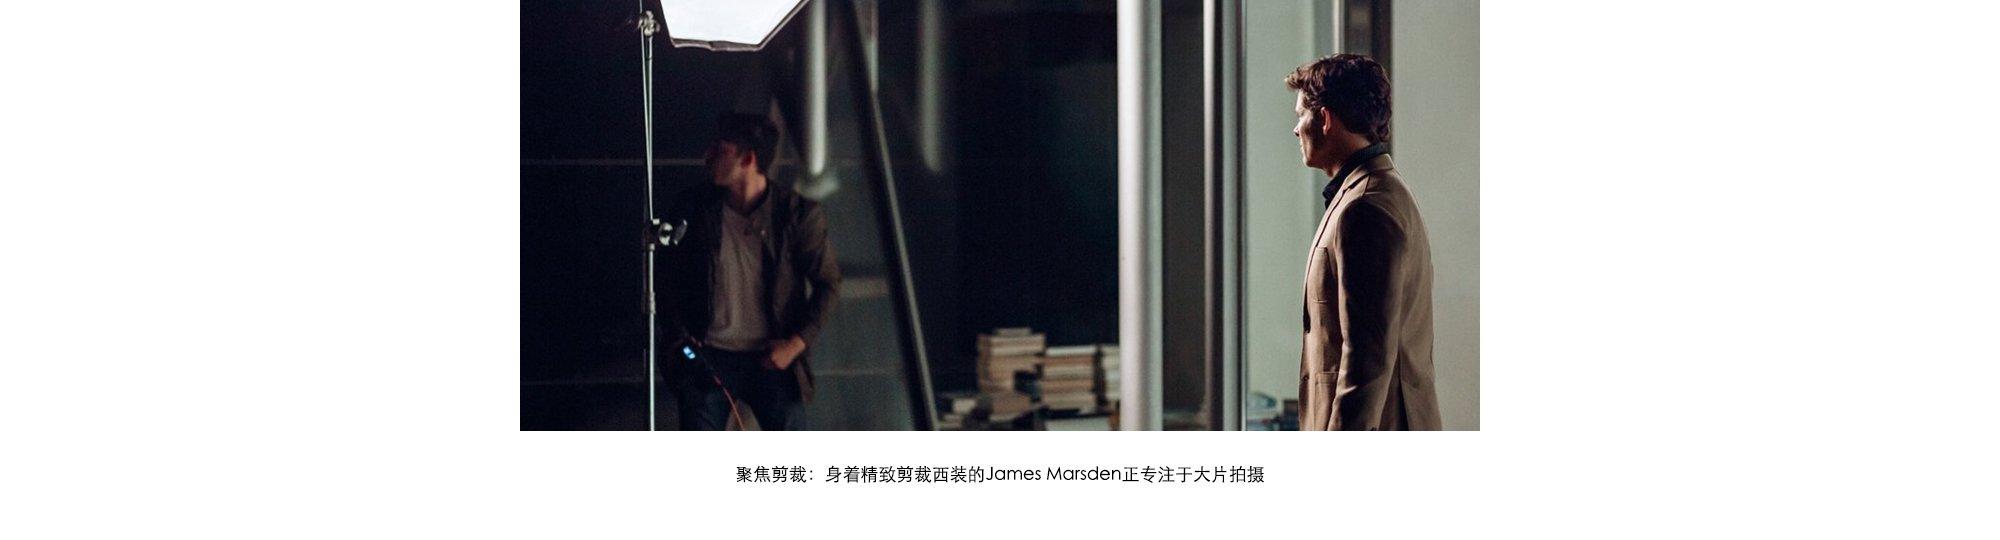 JAMES MARSDEN专访